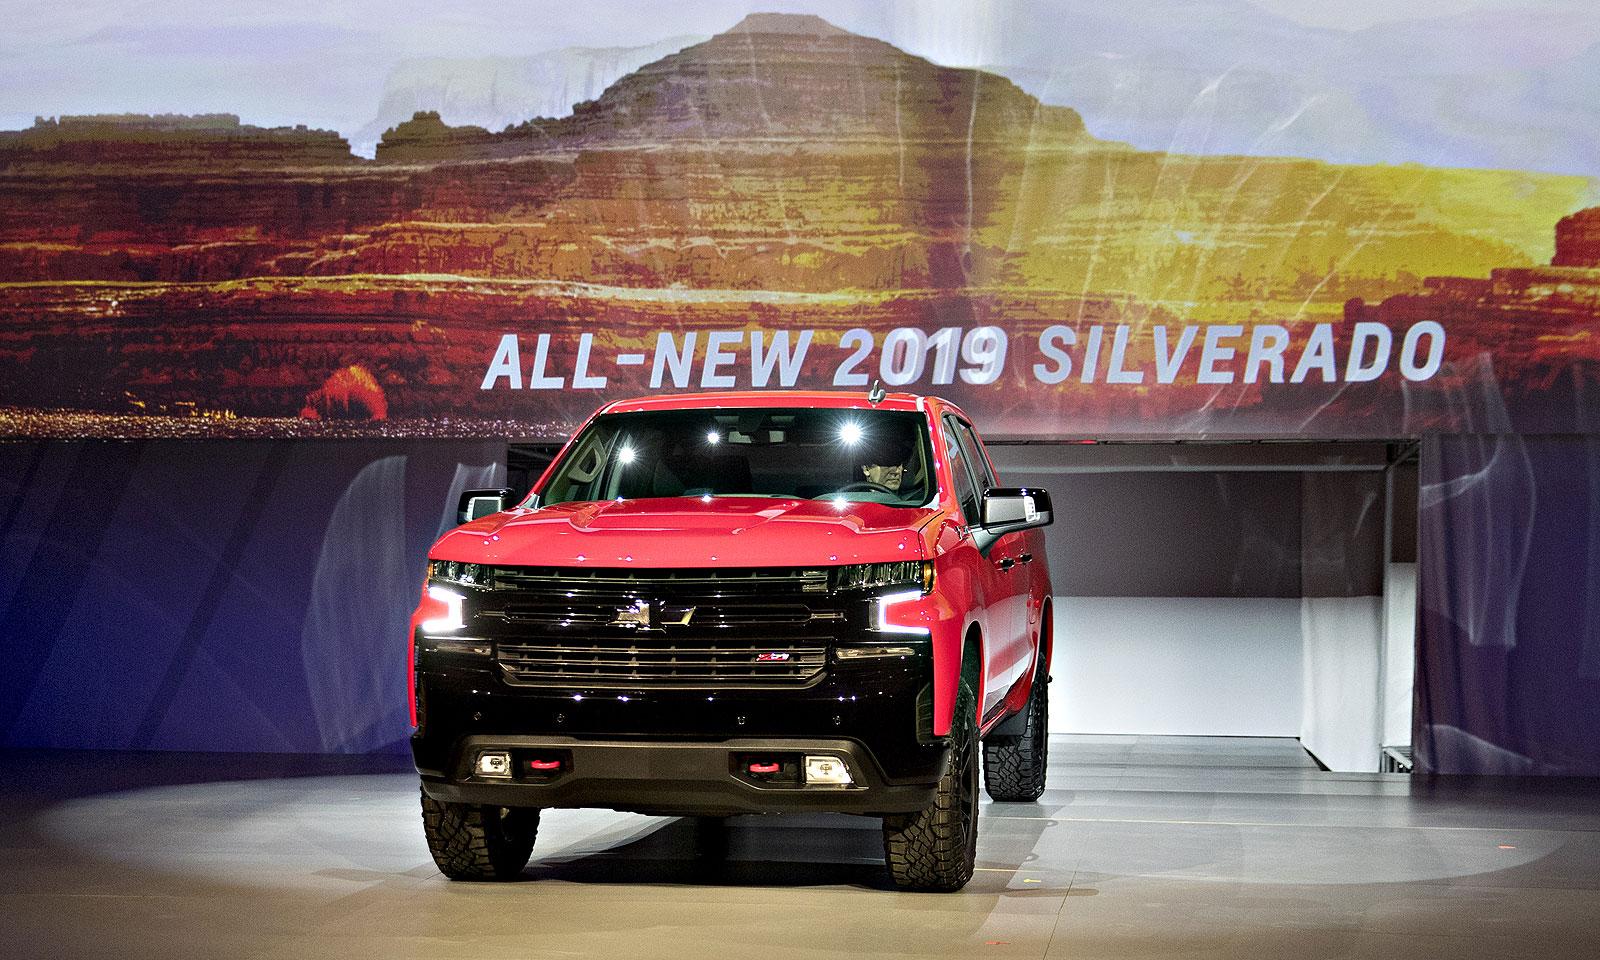 GM picks Mich. plant to build new Silverado diesel engine